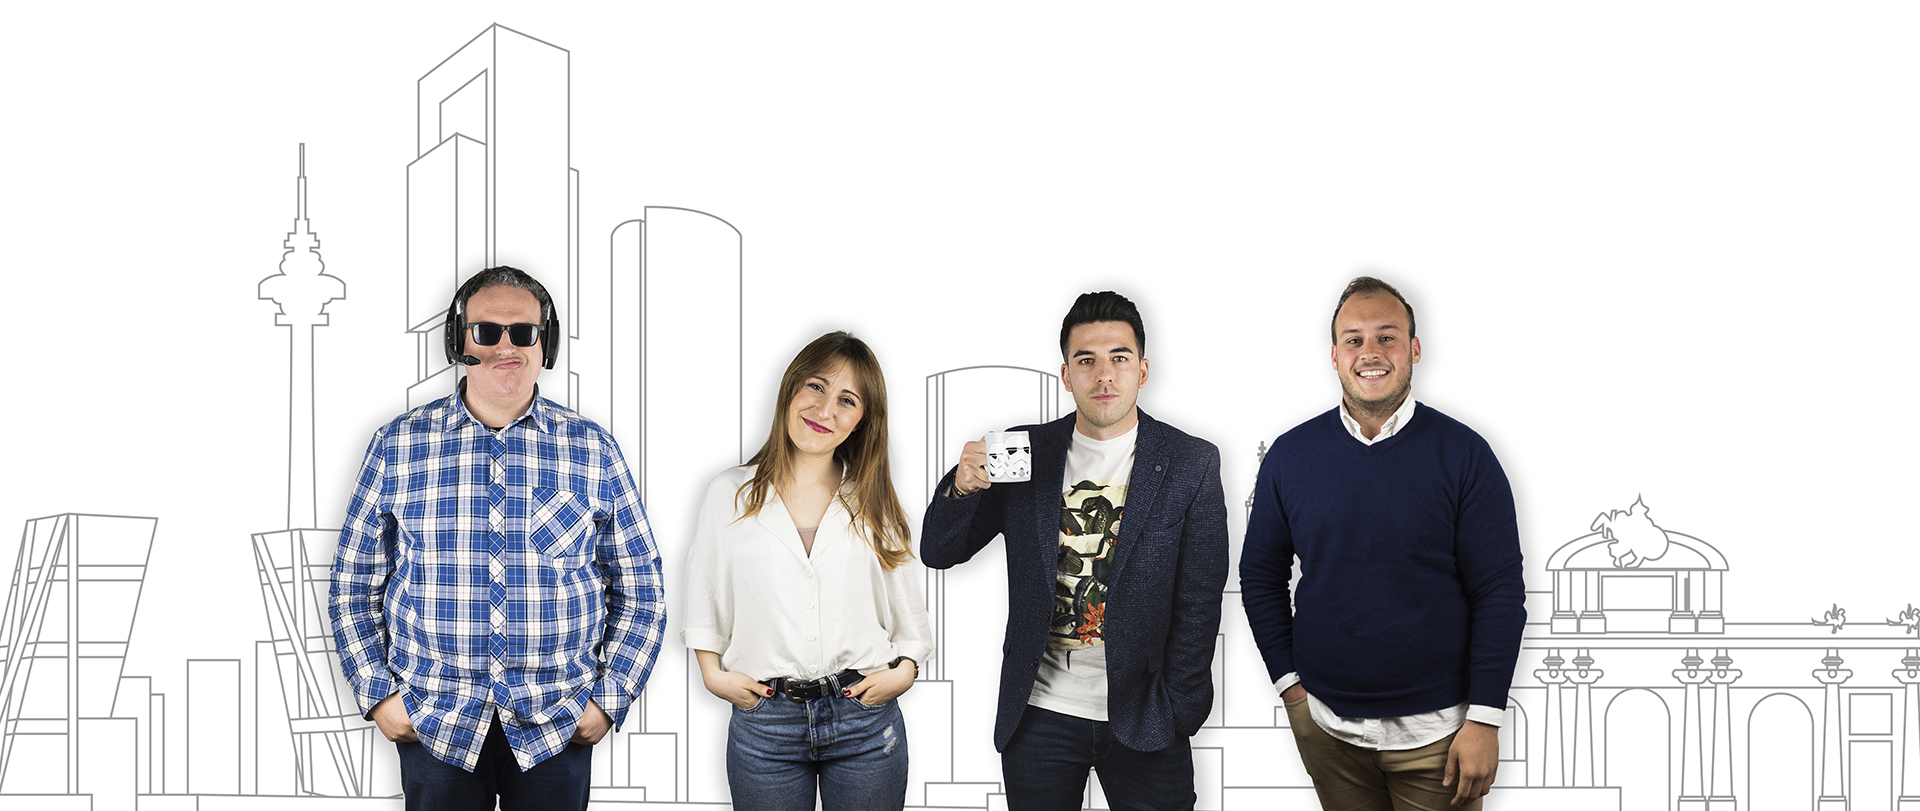 equipo de asap global solution